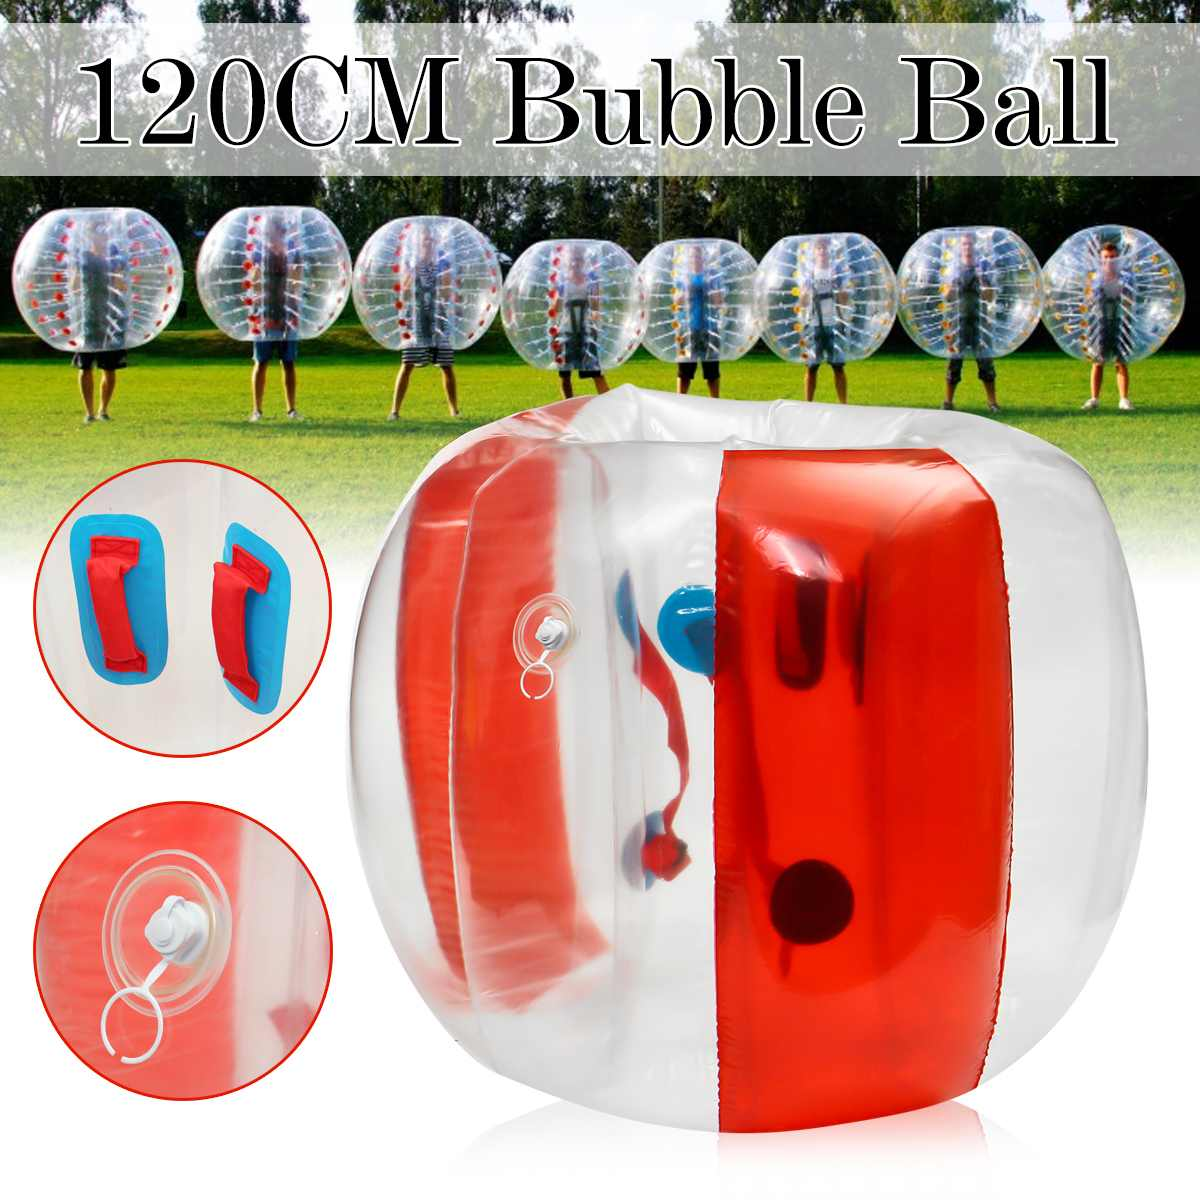 Burbuja de fútbol Zorb Ball 120CM pelota de choque cuerpo inflable Zorb burbuja balón de fútbol niños juguete al aire libre regalo de Navidad